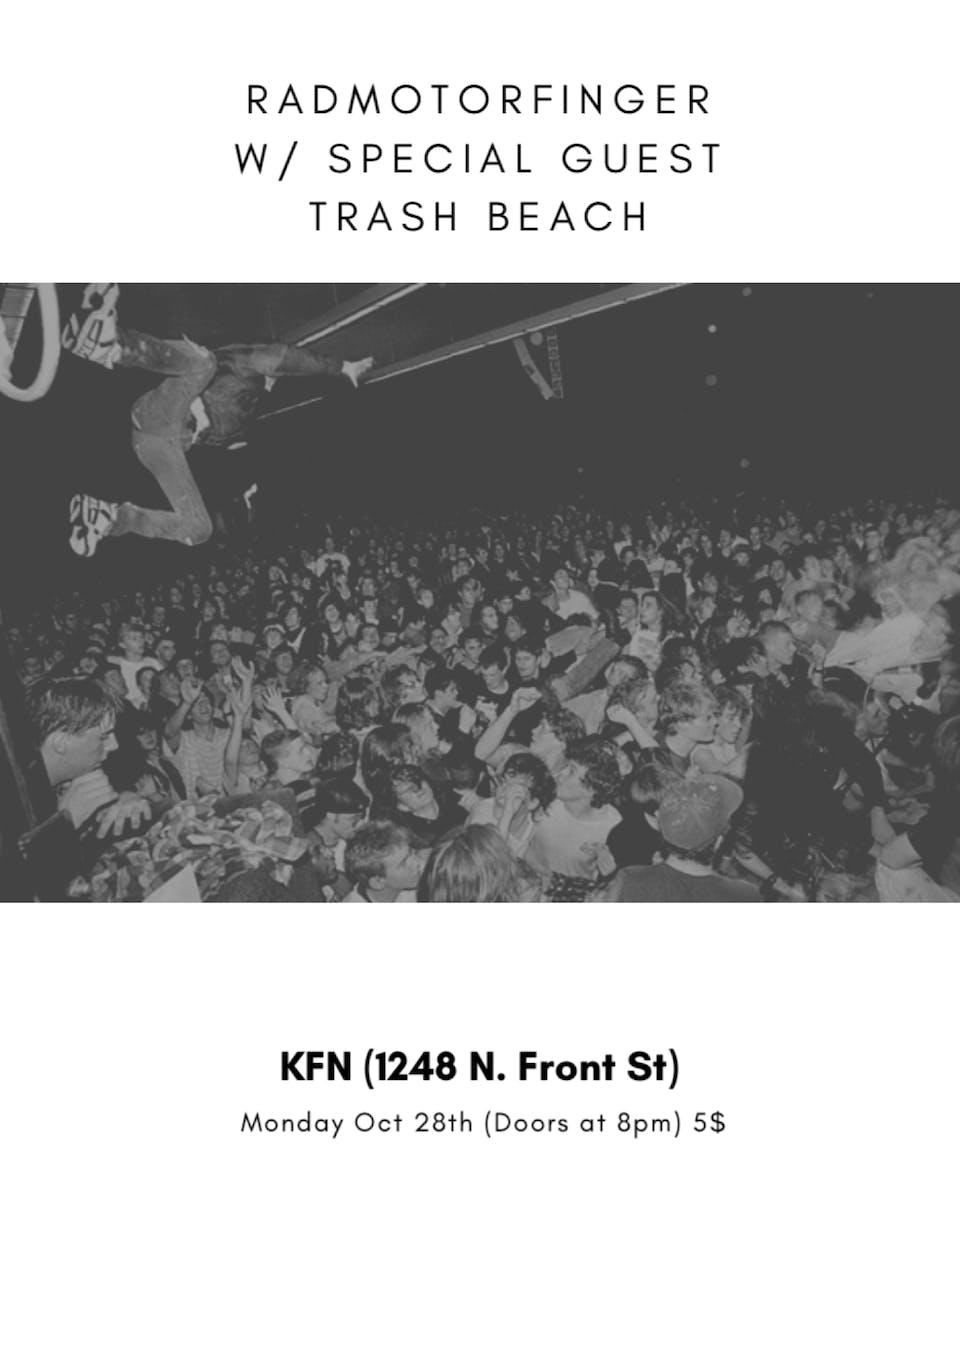 RADMOTORFINGER w/ special guest Trash Beach